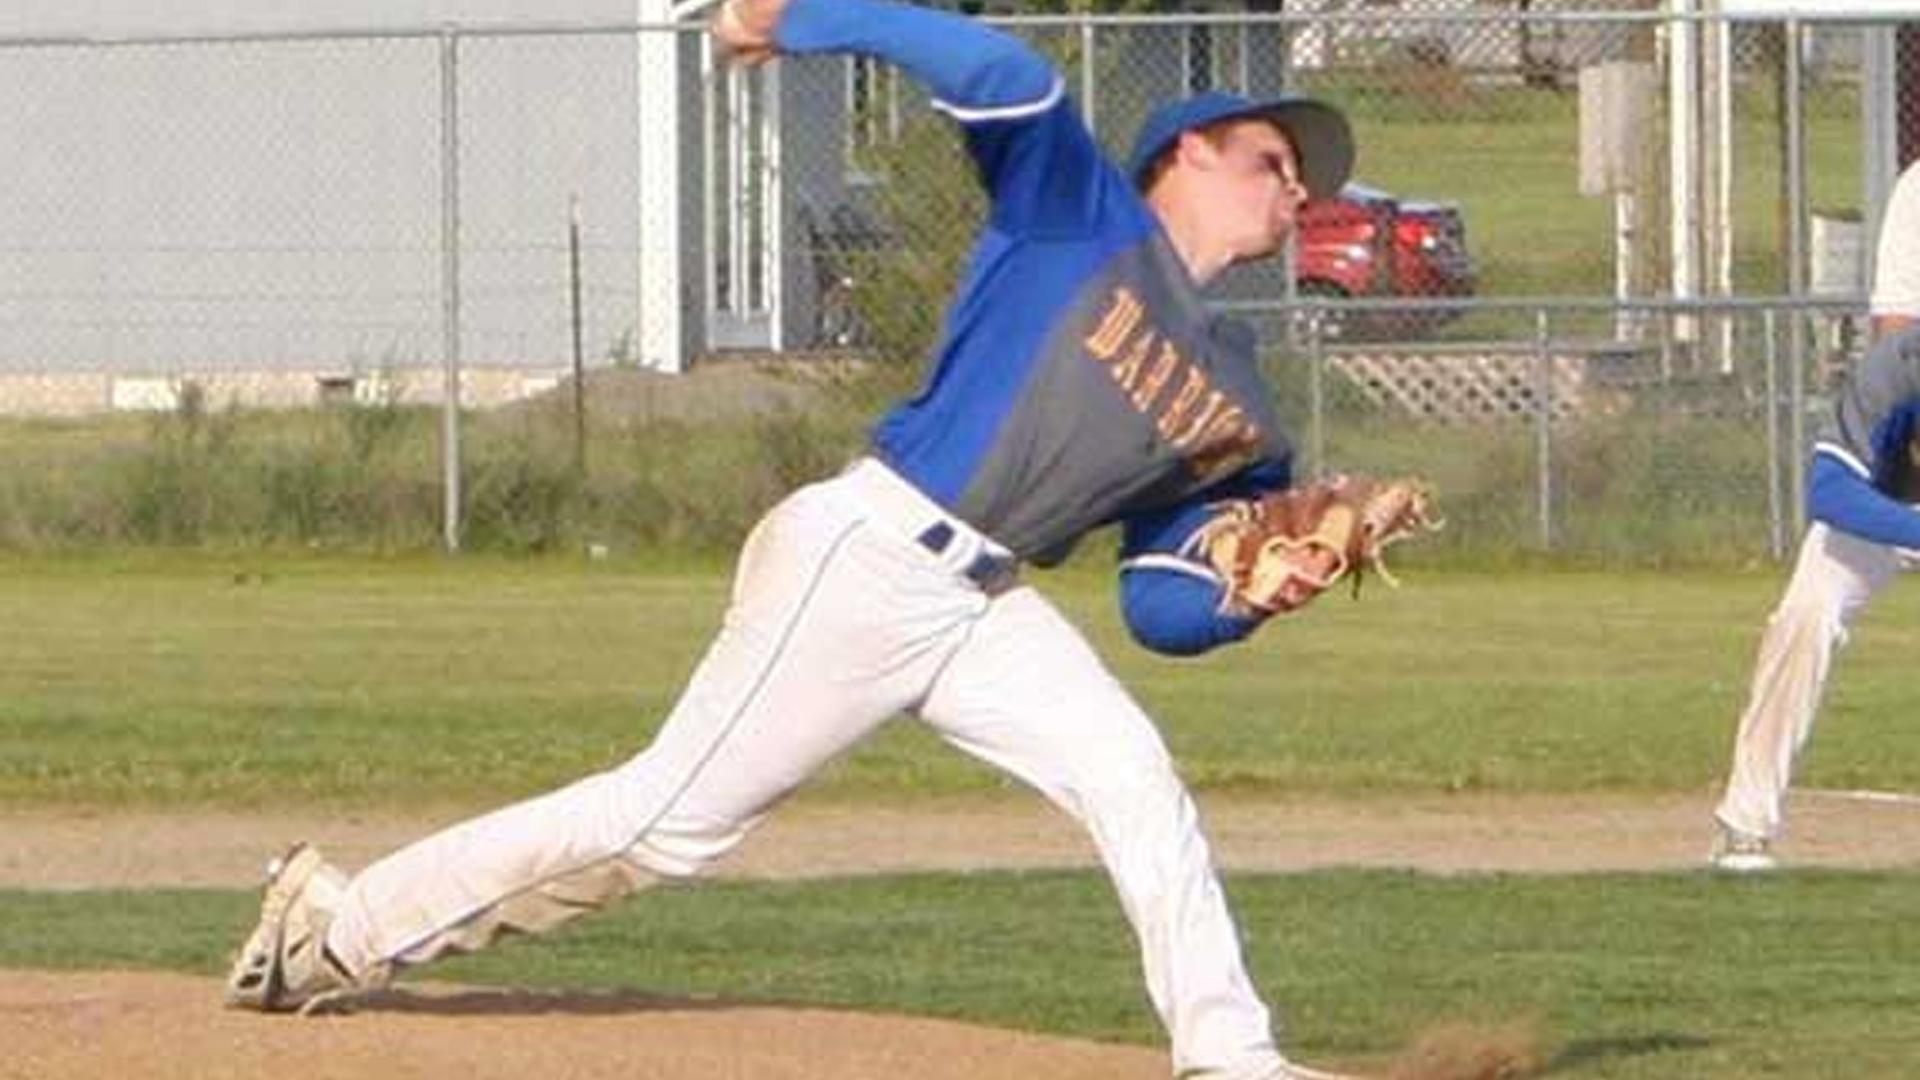 Dylan-fosnacht-pitcher-051414-facebook-ftr_in0dp6s1v05g14ns20ckl5uj2